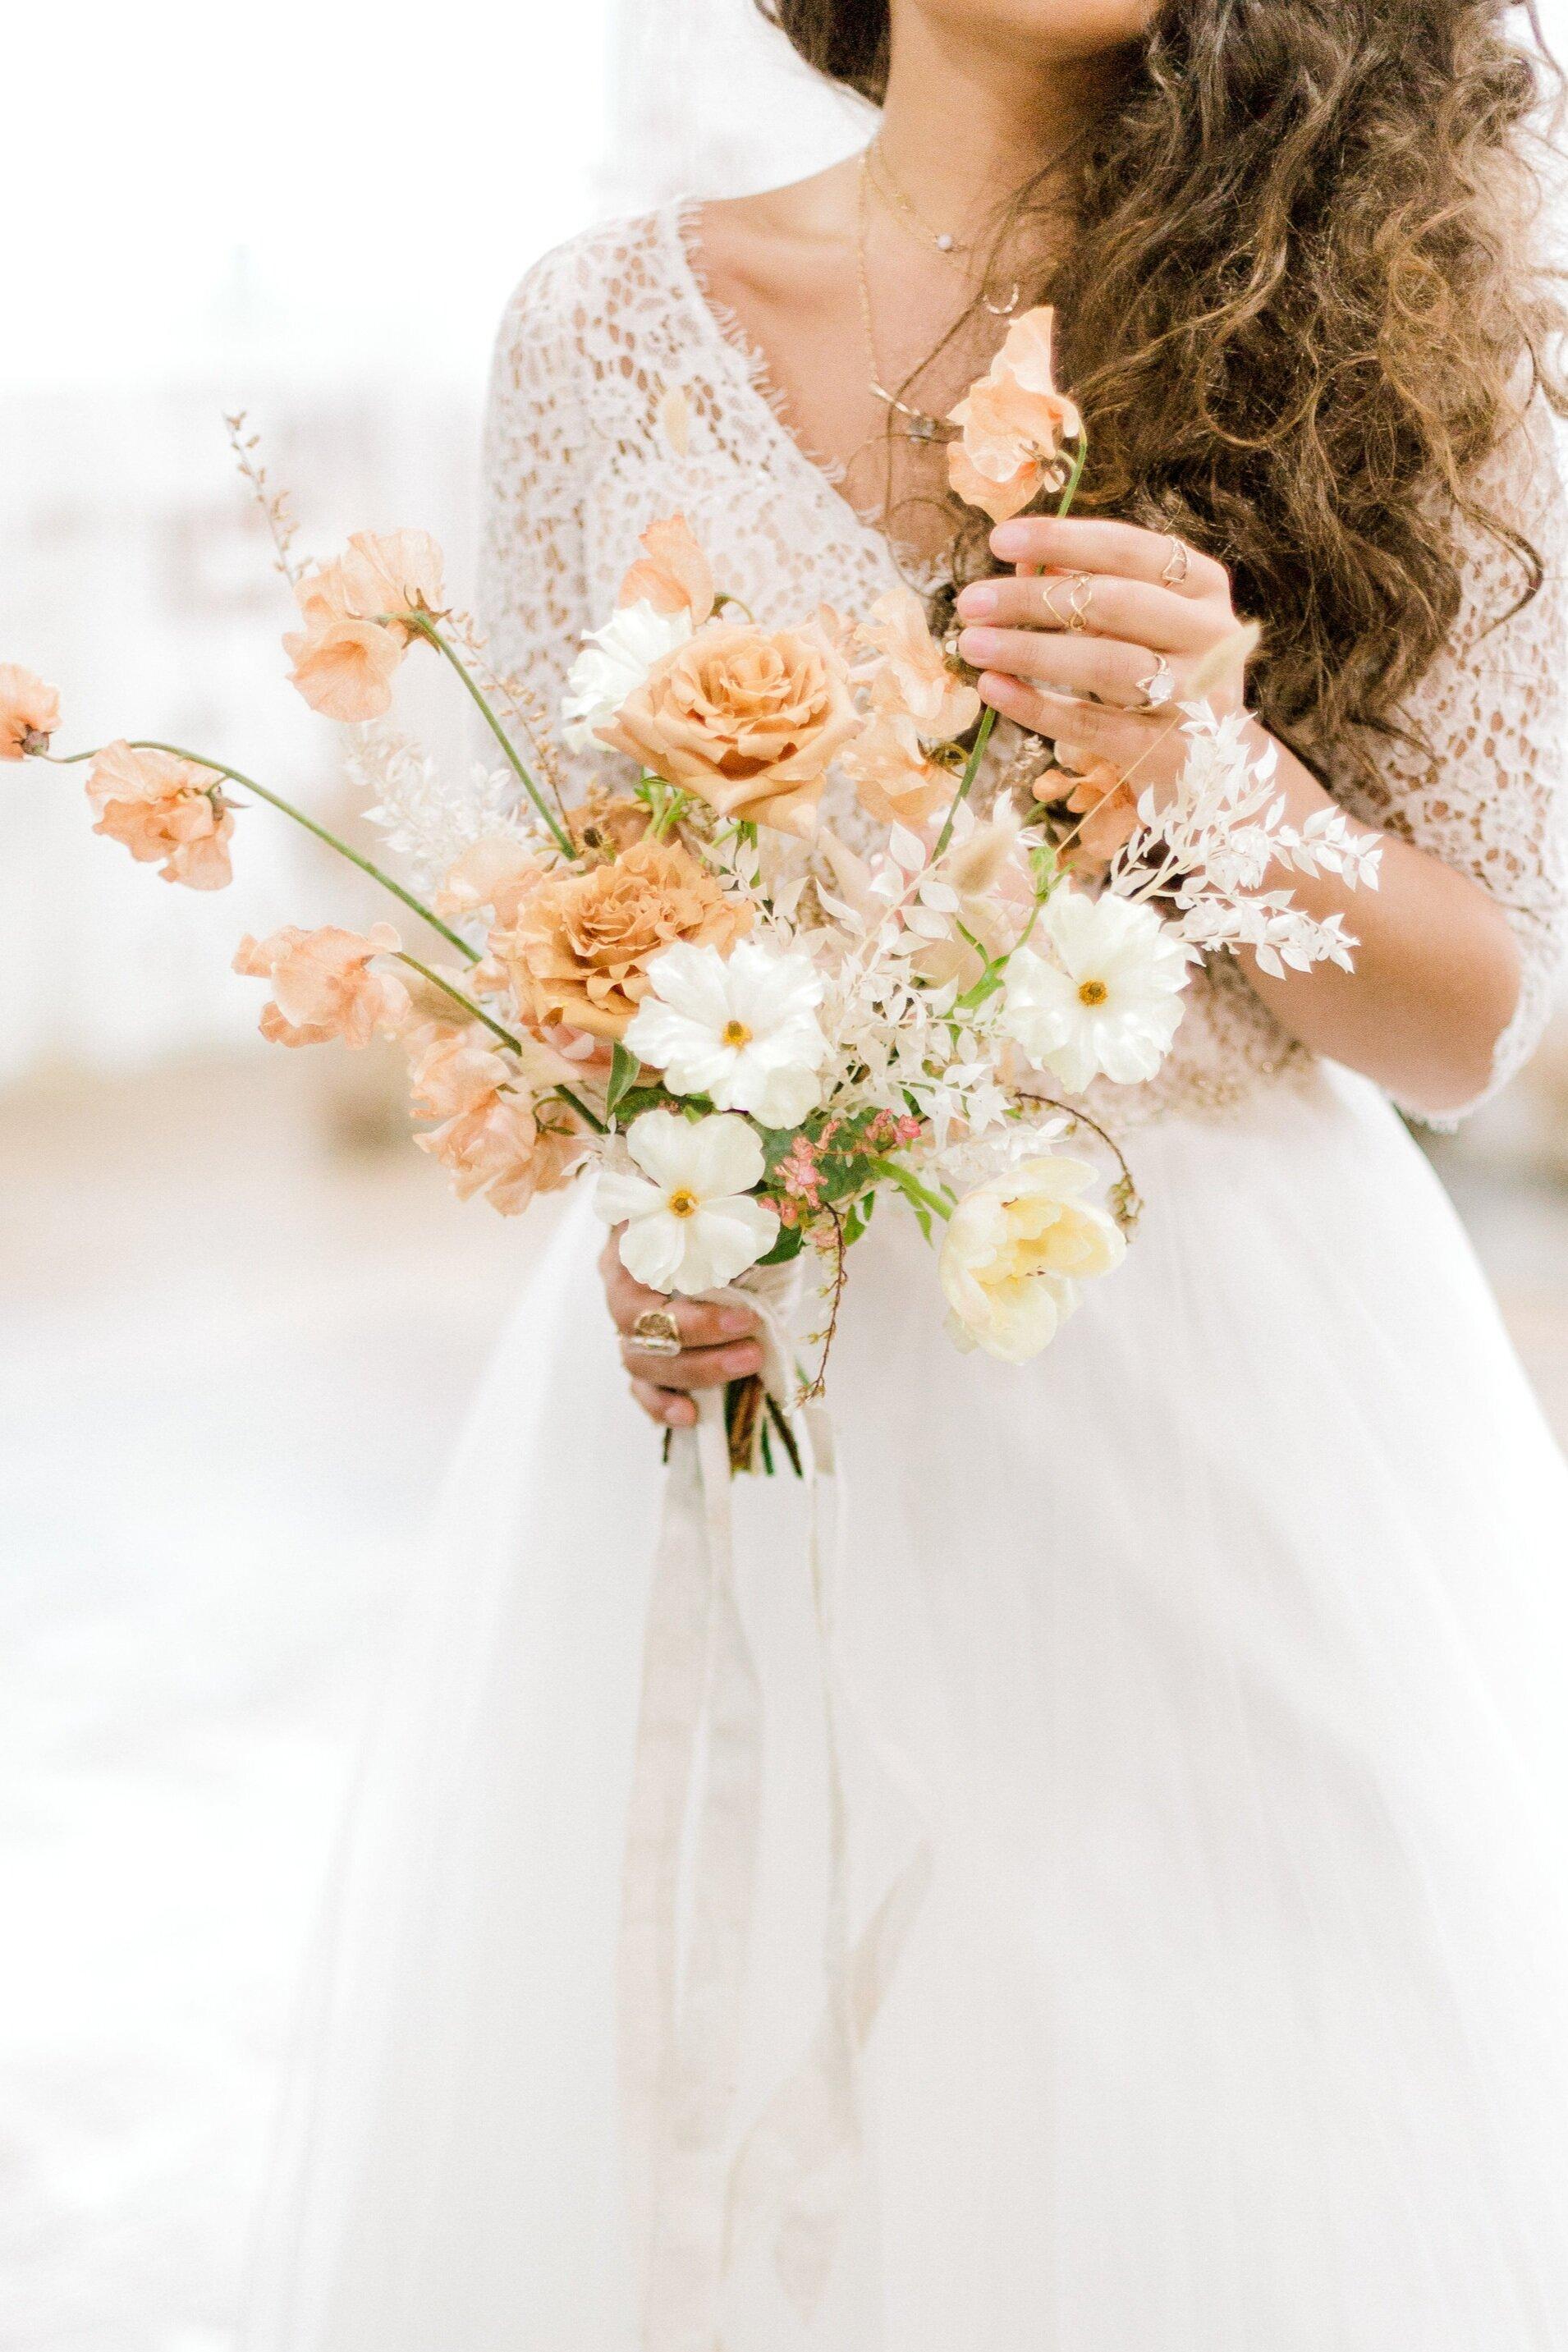 Neutral floral inspired styled bridal studio shoot fox and finch studios bethlehem pennylvania wedding photographer (54 of 155).jpg